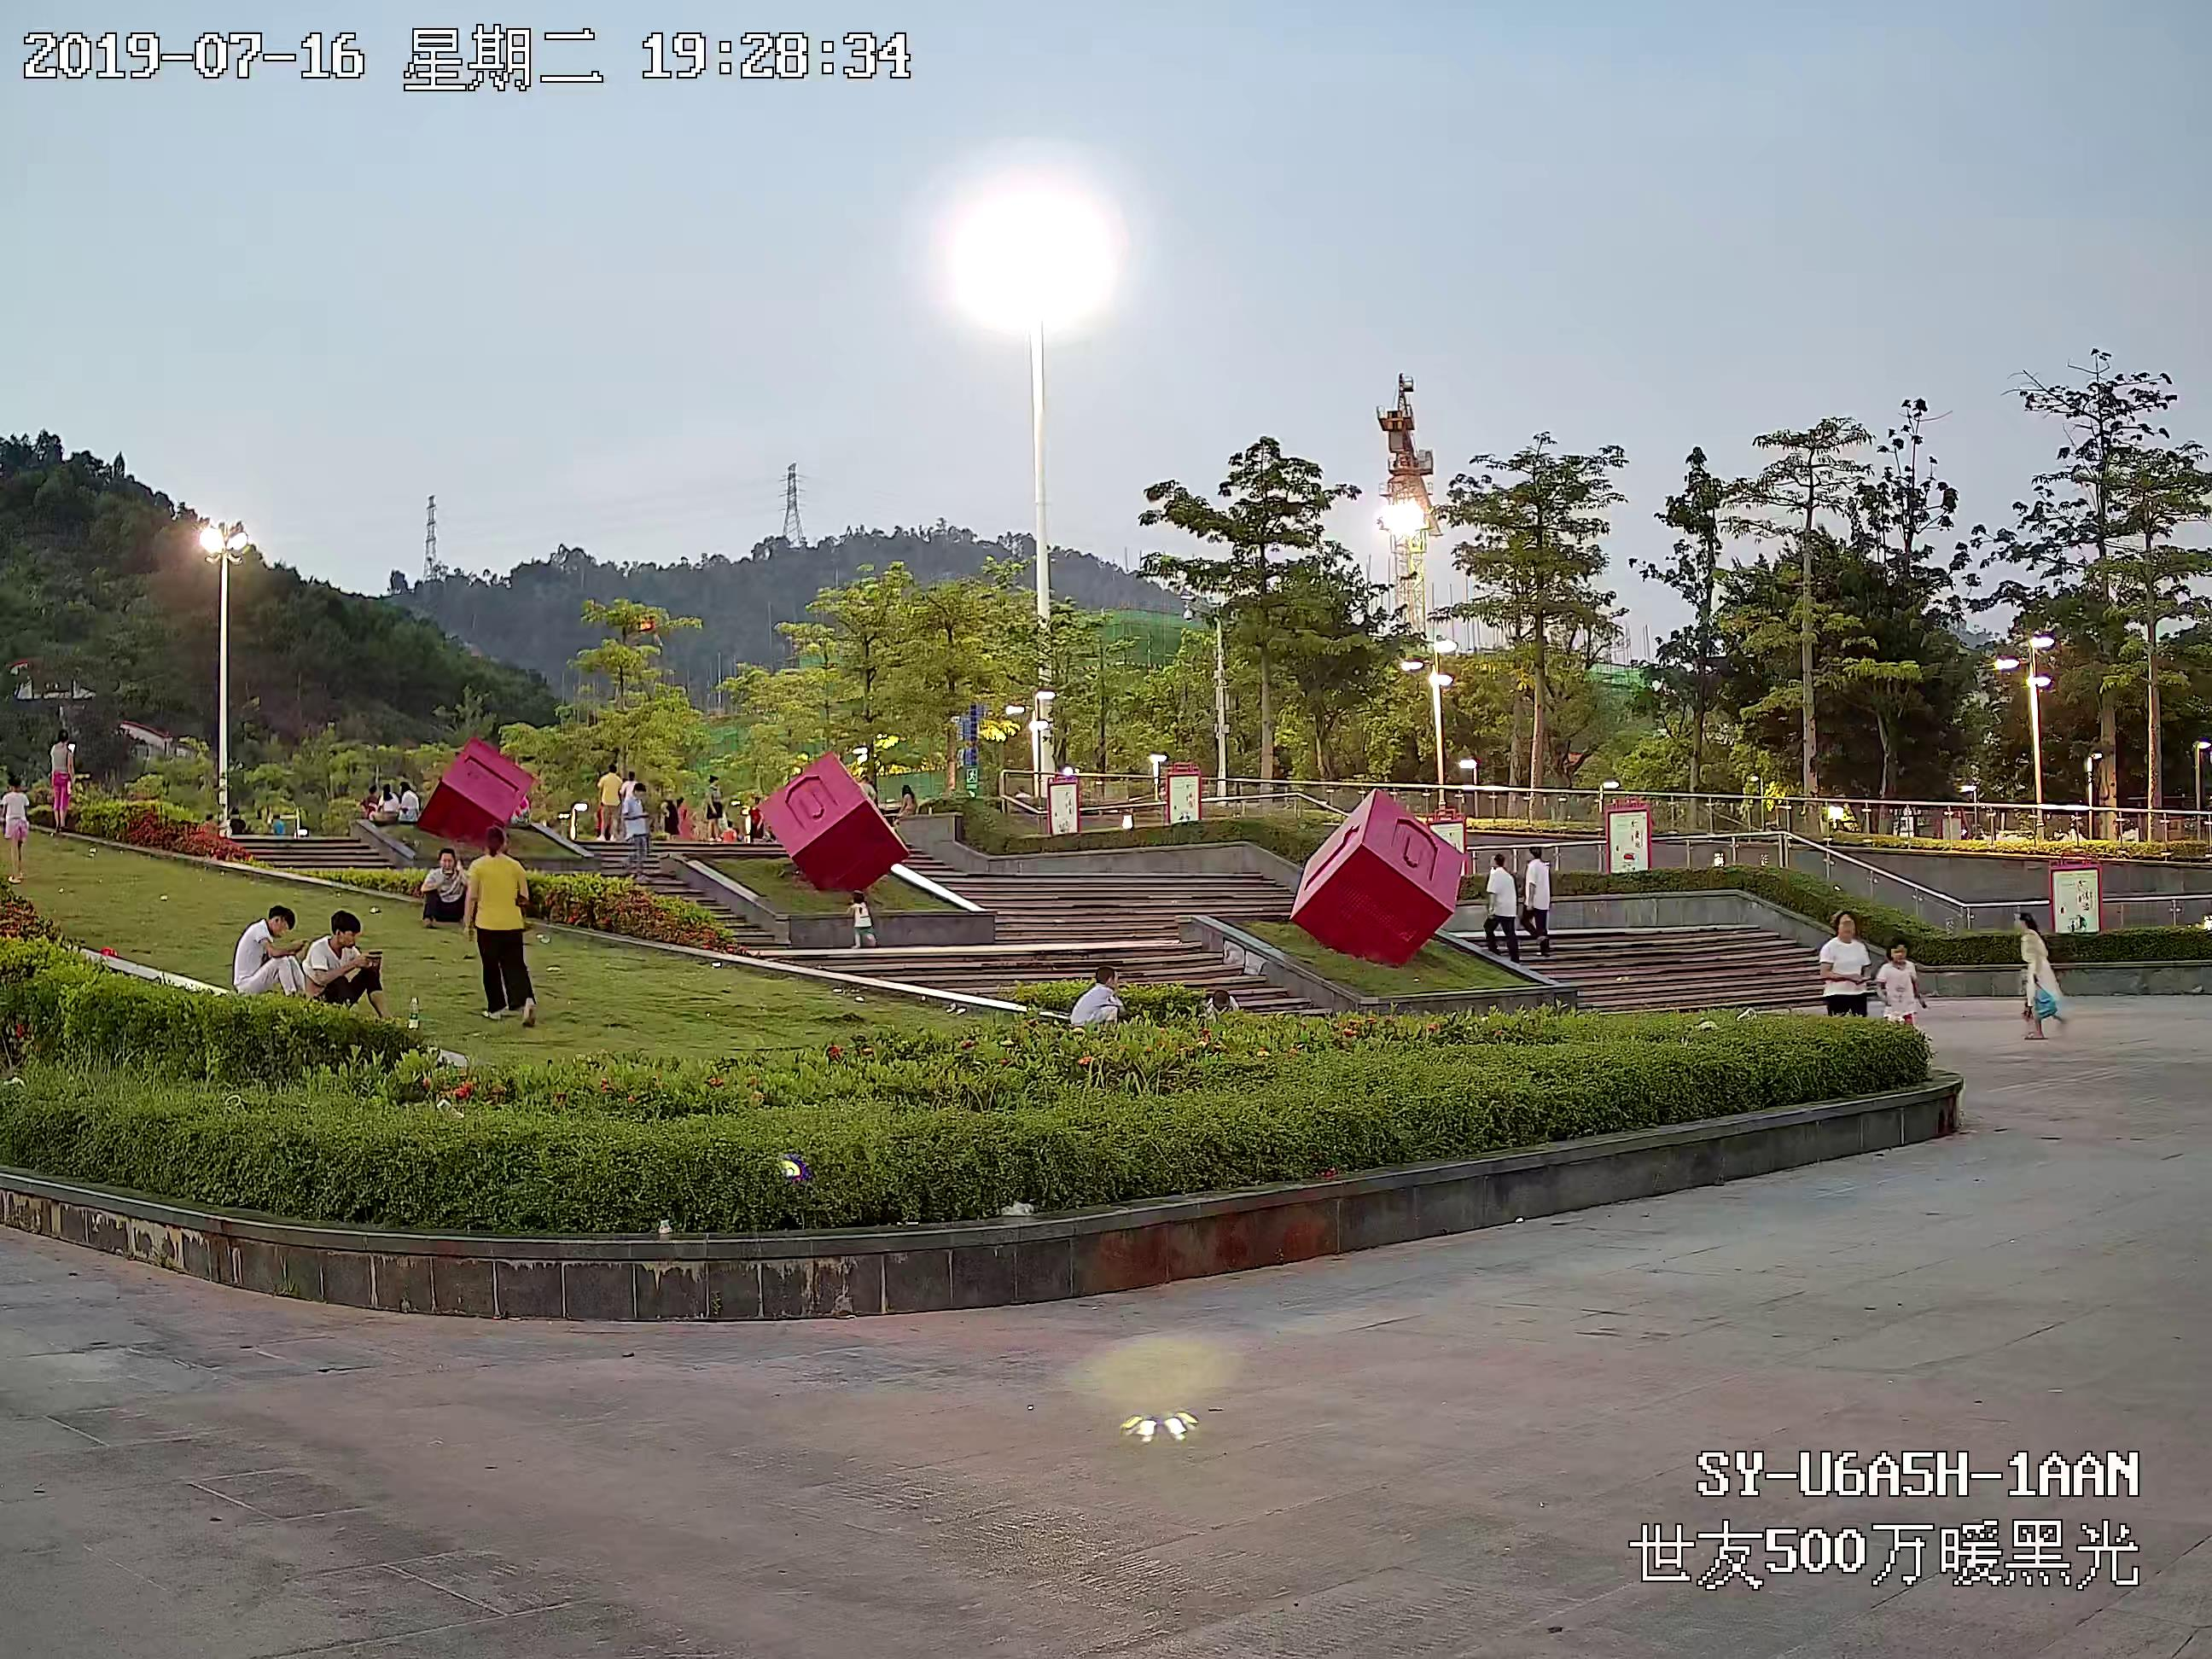 SY-U6A5H-1AAN日夜全彩效果摄像机